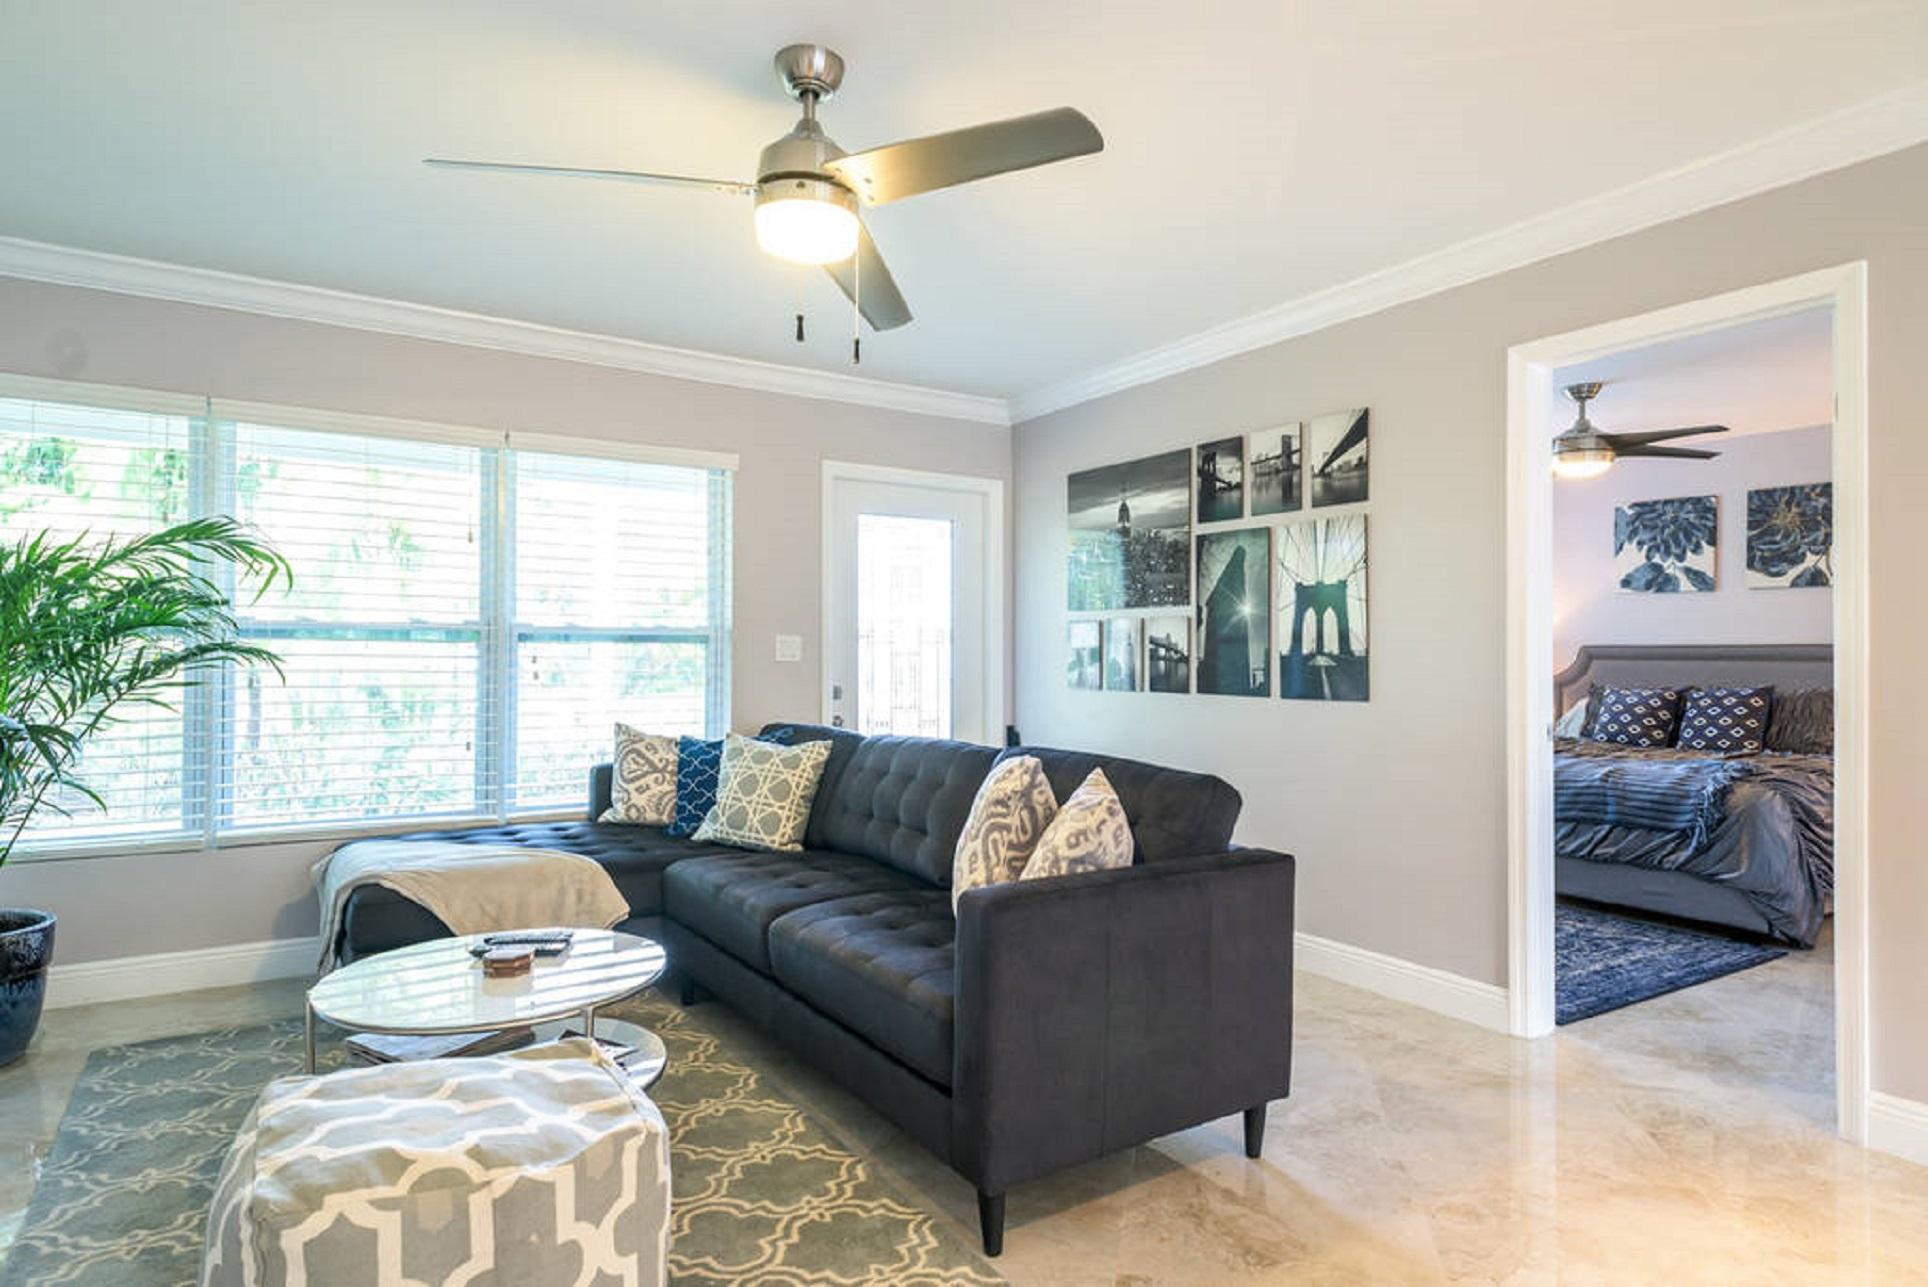 Stylish 3 bedroom home